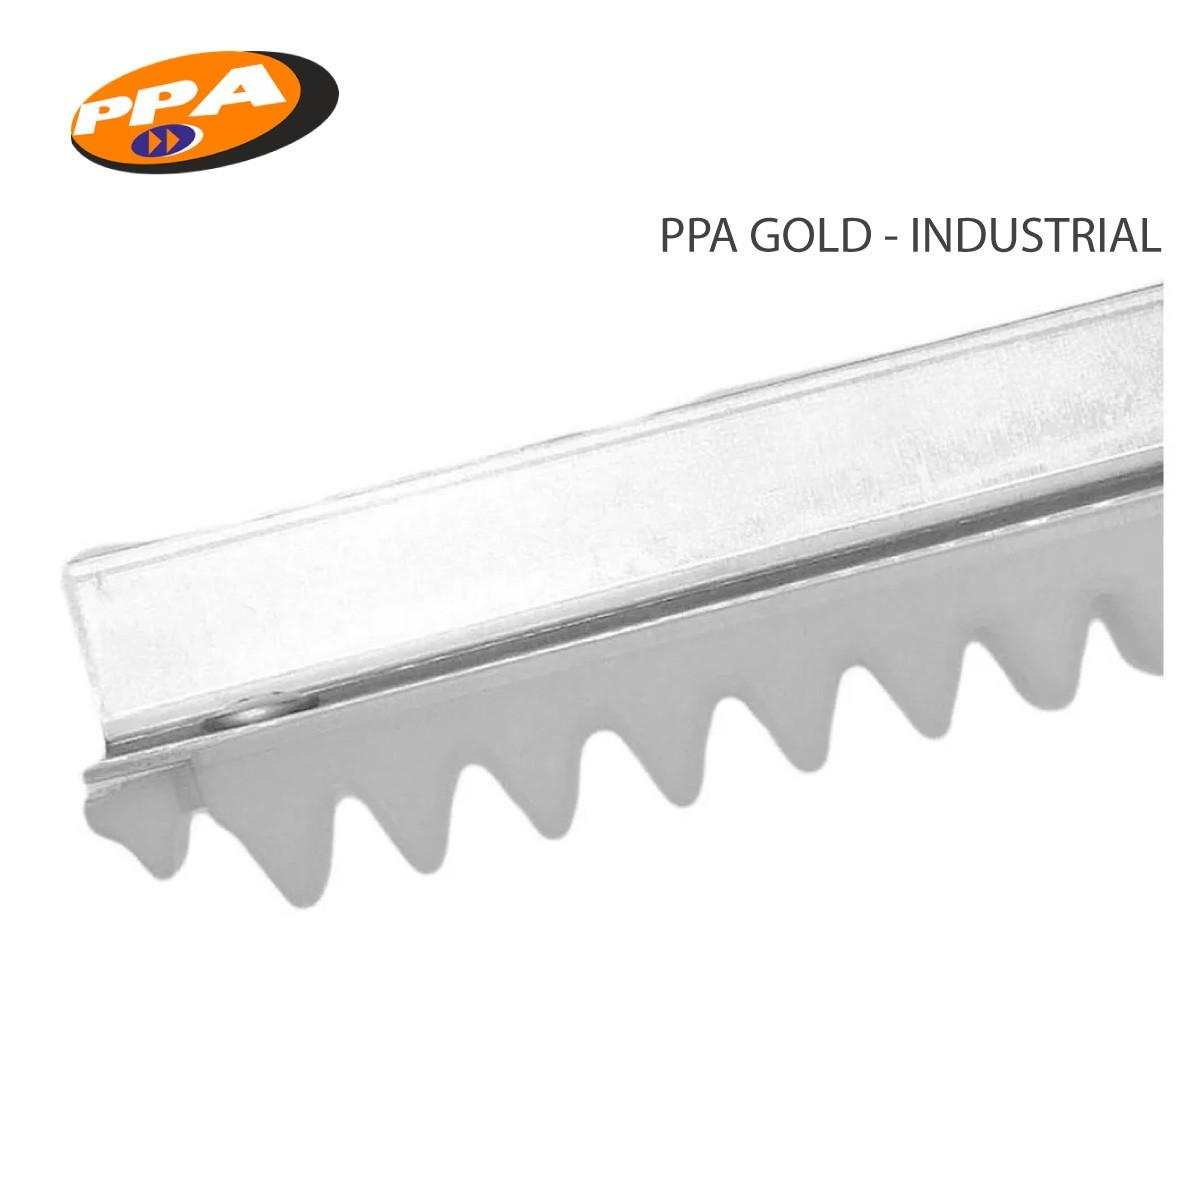 Barra Cremalheira Gold Industrial Trilho Alumínio-Portão Deslizante-Ppa3m